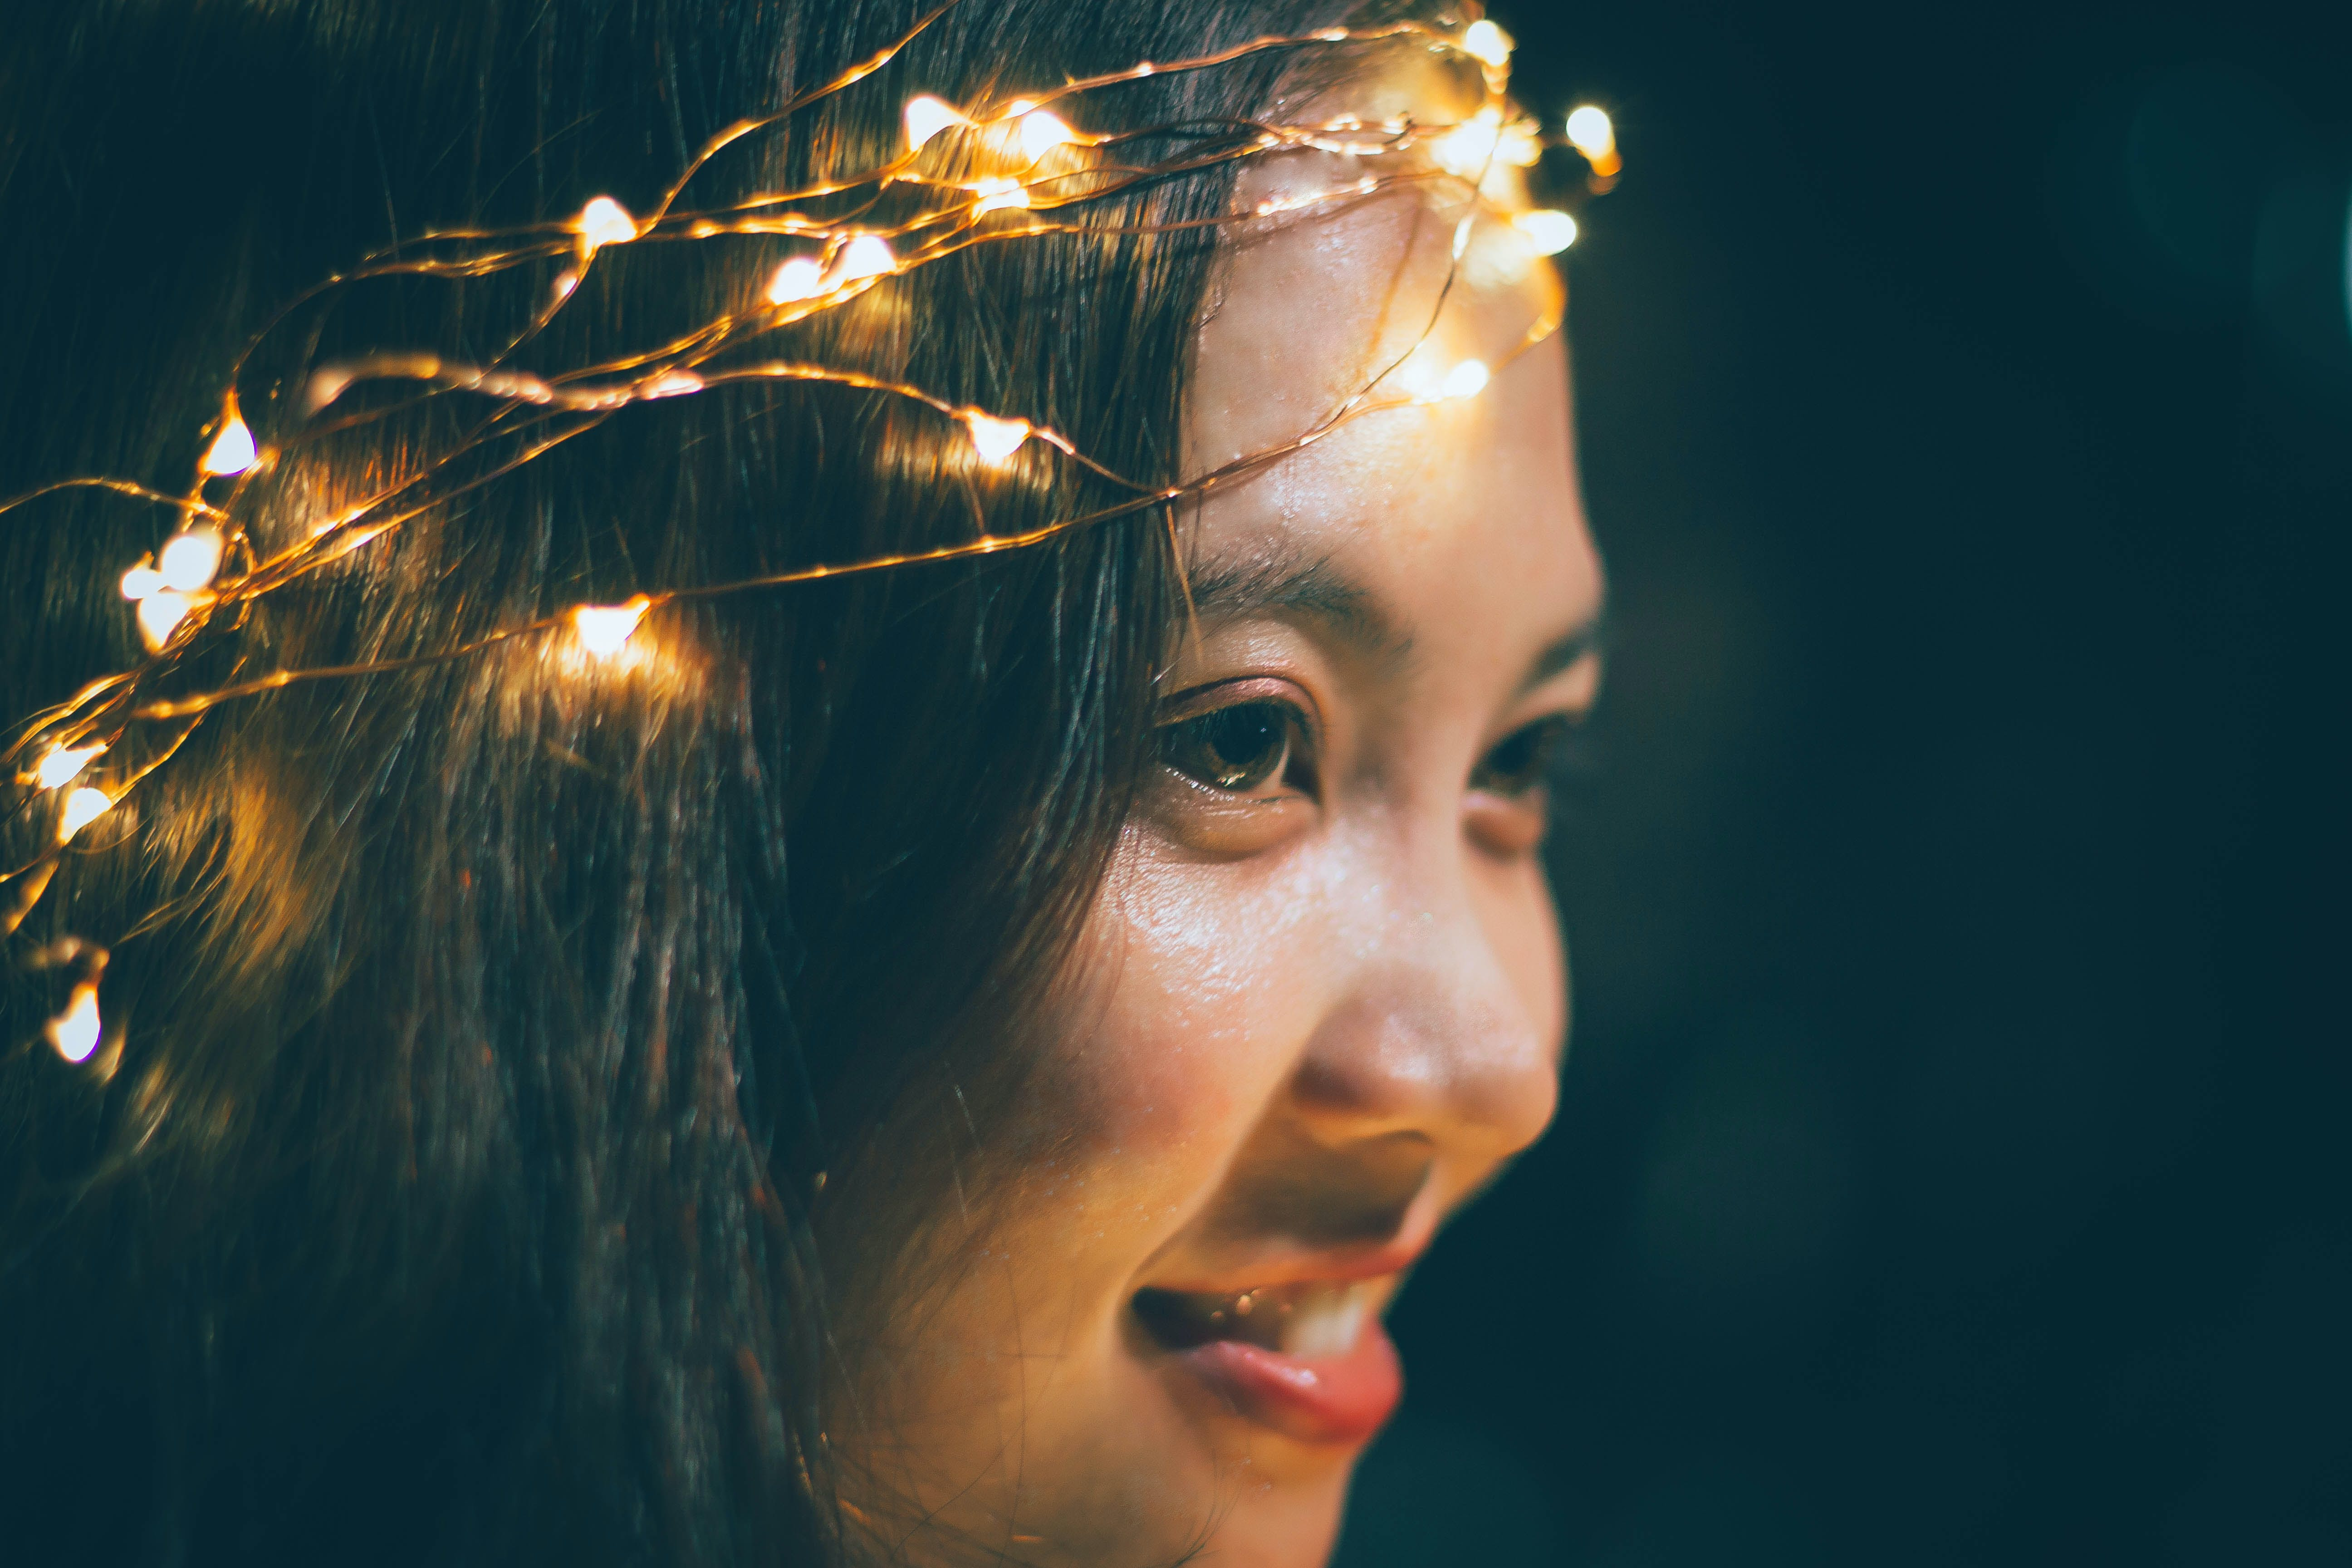 Woman Wearing String Lights